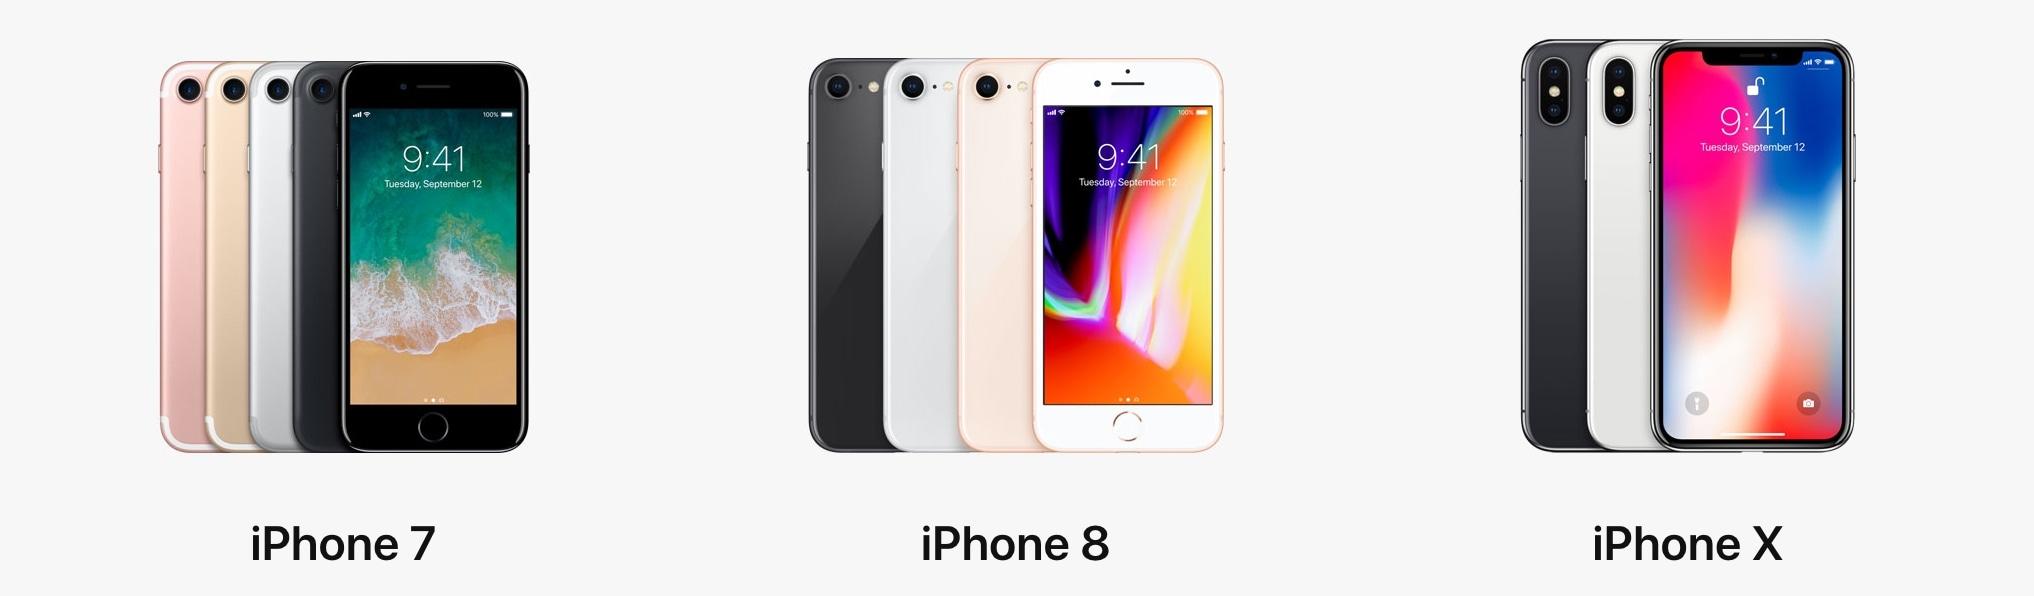 iPhone X, iPhone 8, iPhone 7